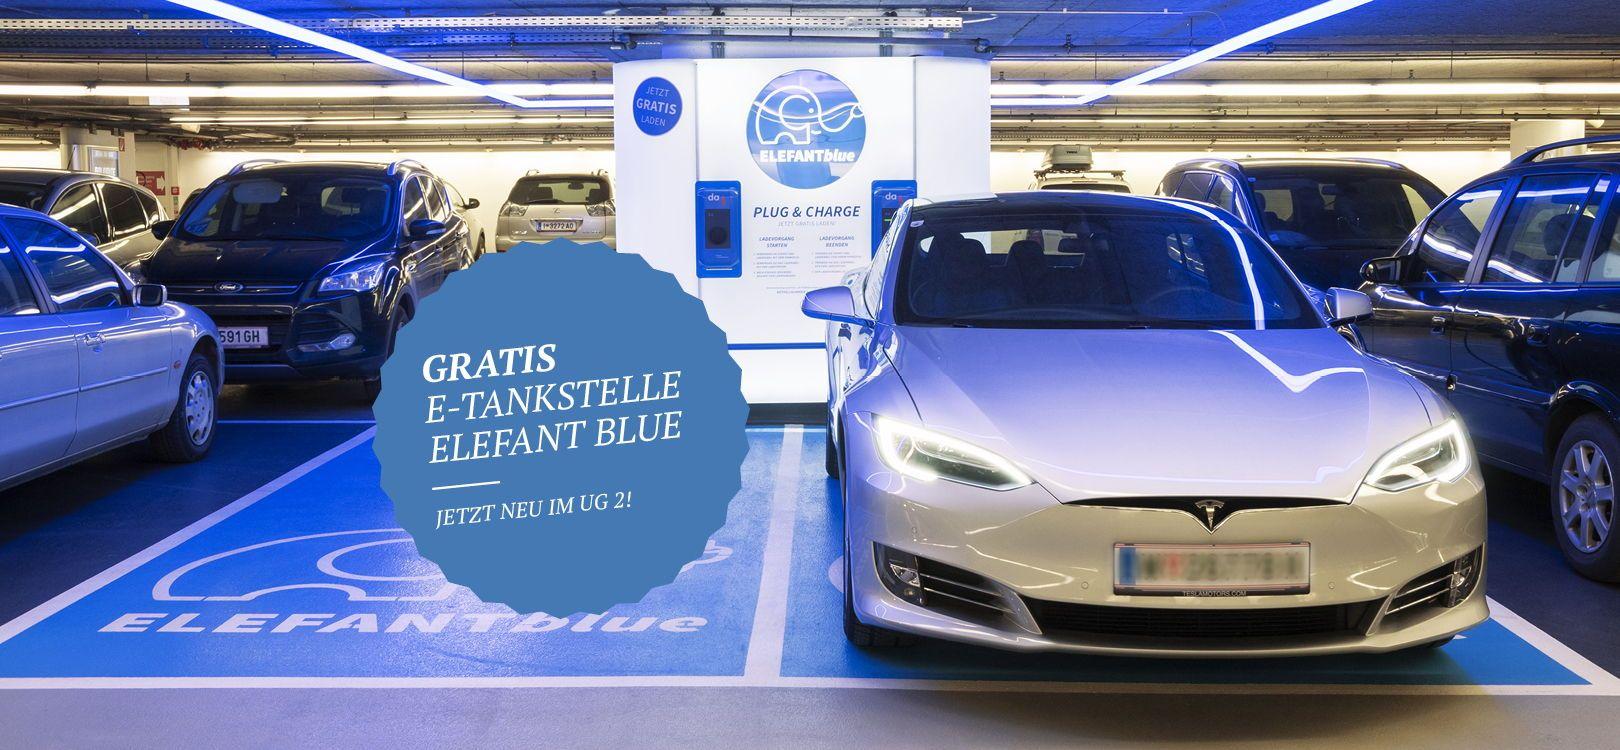 Elefant Blue E-Tankstelle im Kaufhaus Tyrol